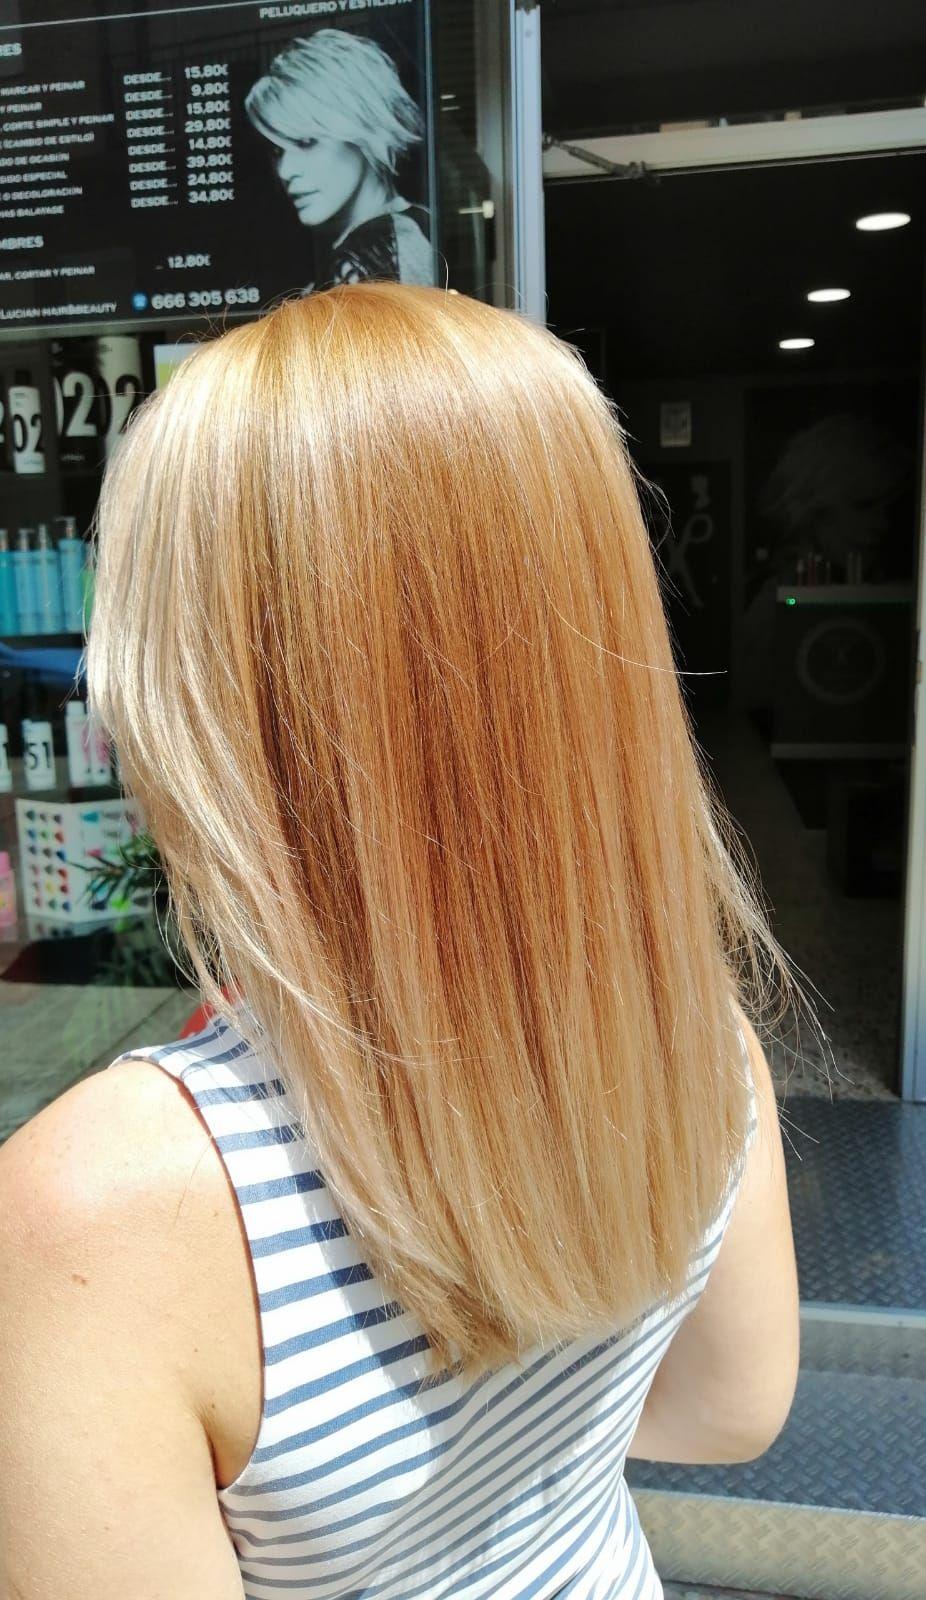 Foto 29 de Peluquería y maquillaje en  | Lucian Hair&Beauty